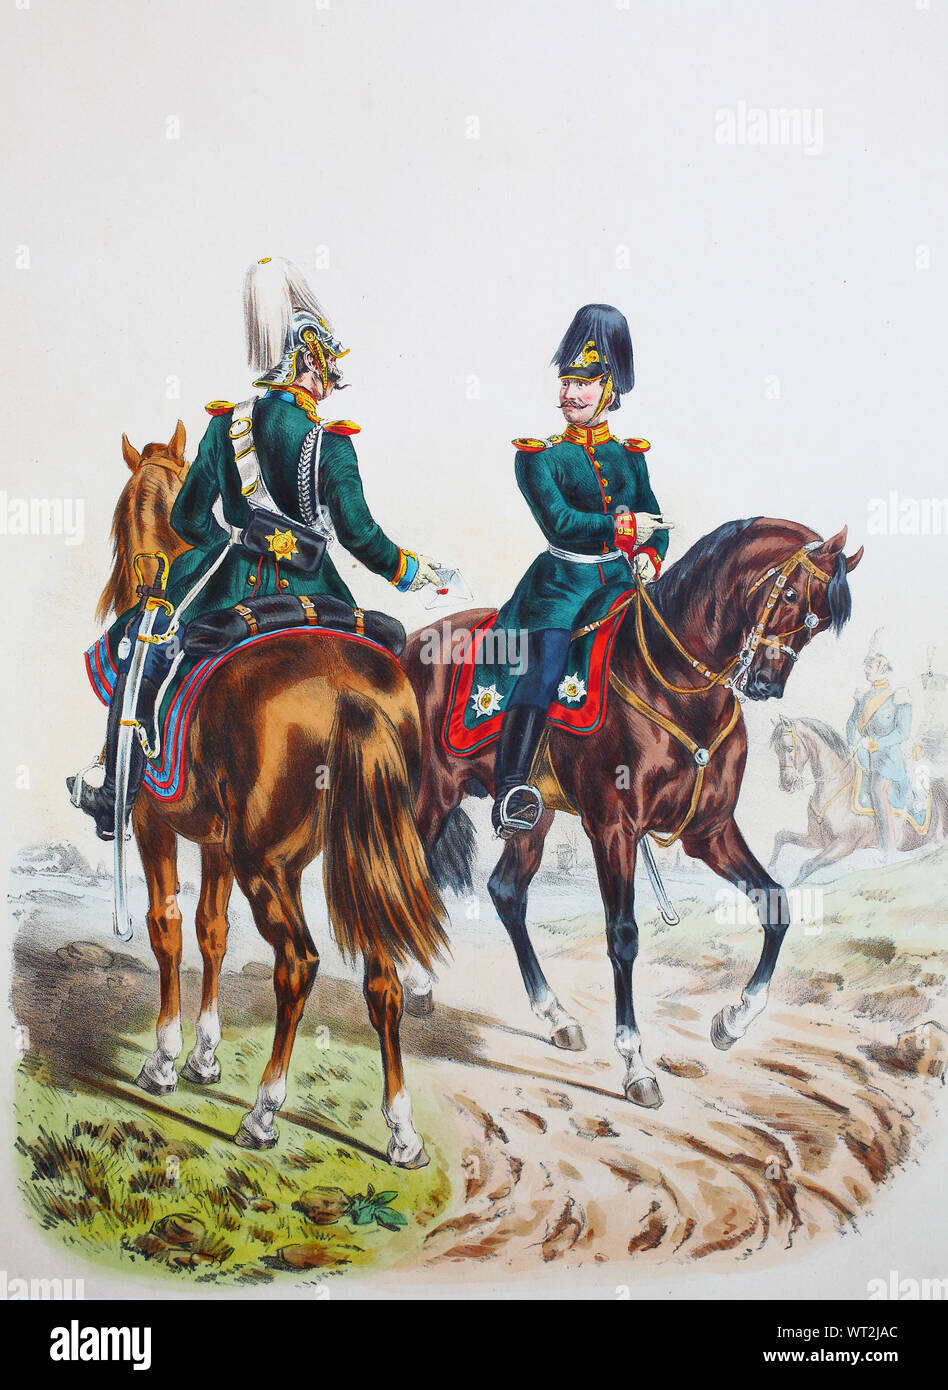 Garde Du Corps Marseille gendarmerie uniform stock photos & gendarmerie uniform stock